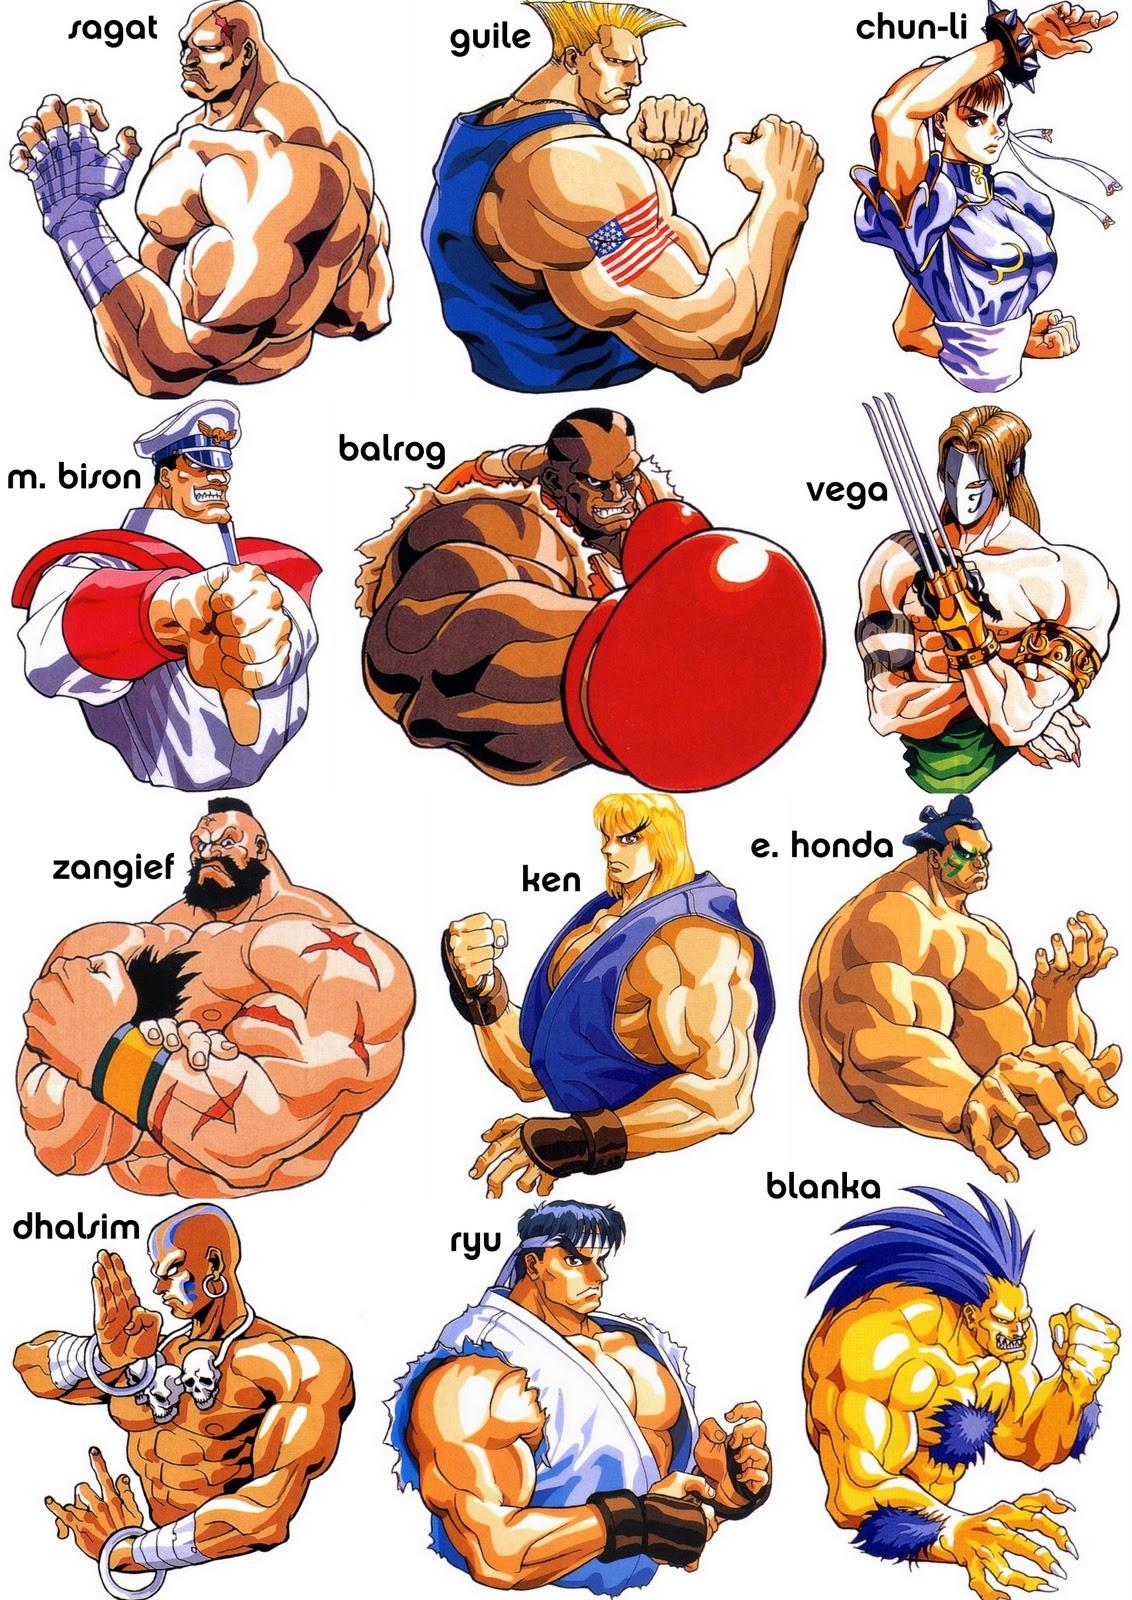 M Bison Street Fighter Movie New Generation of Figh...